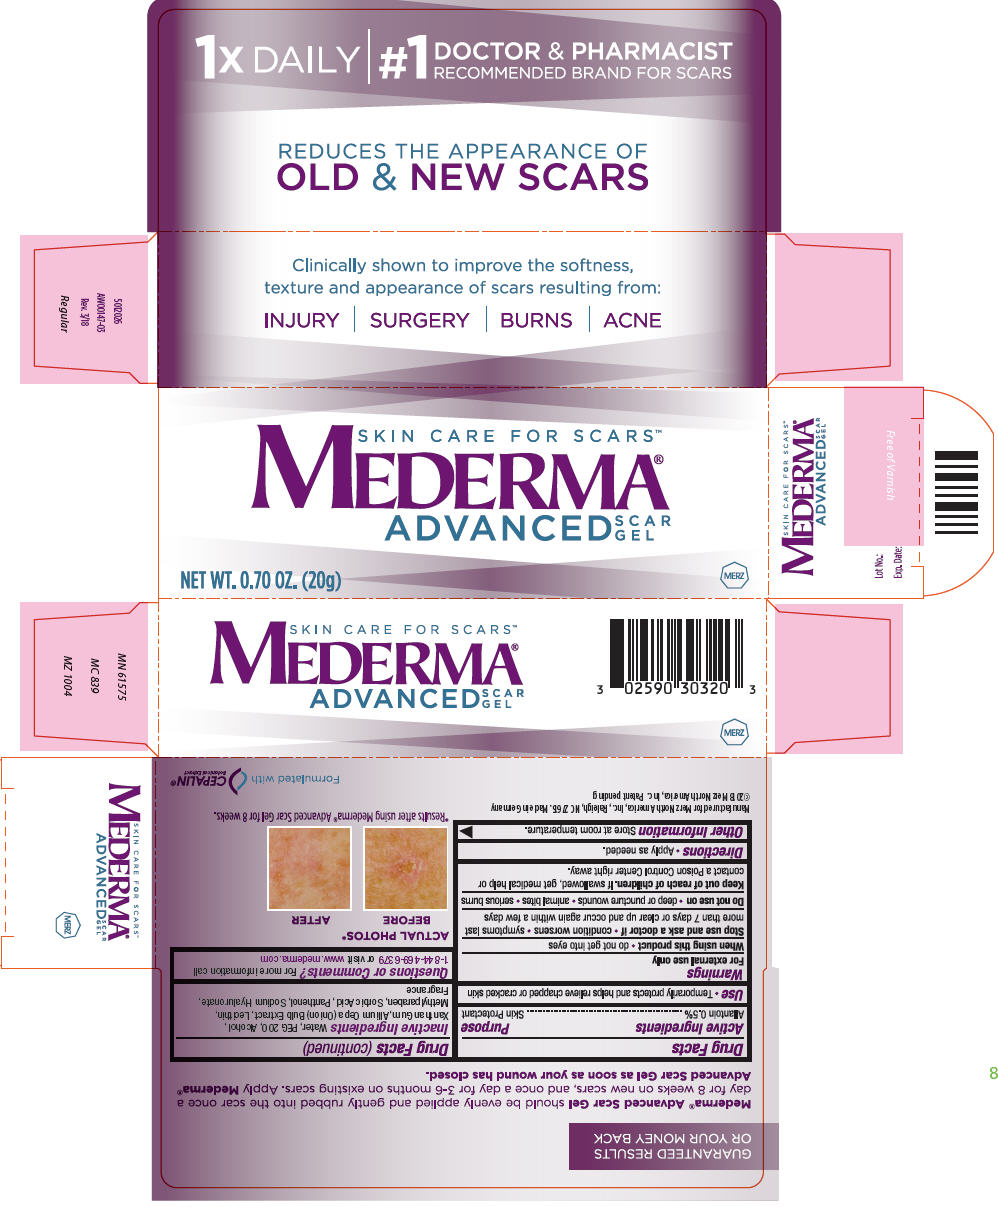 Mederma Advanced Scar (Allantoin) Gel [Merz Pharmaceuticals, Llc]